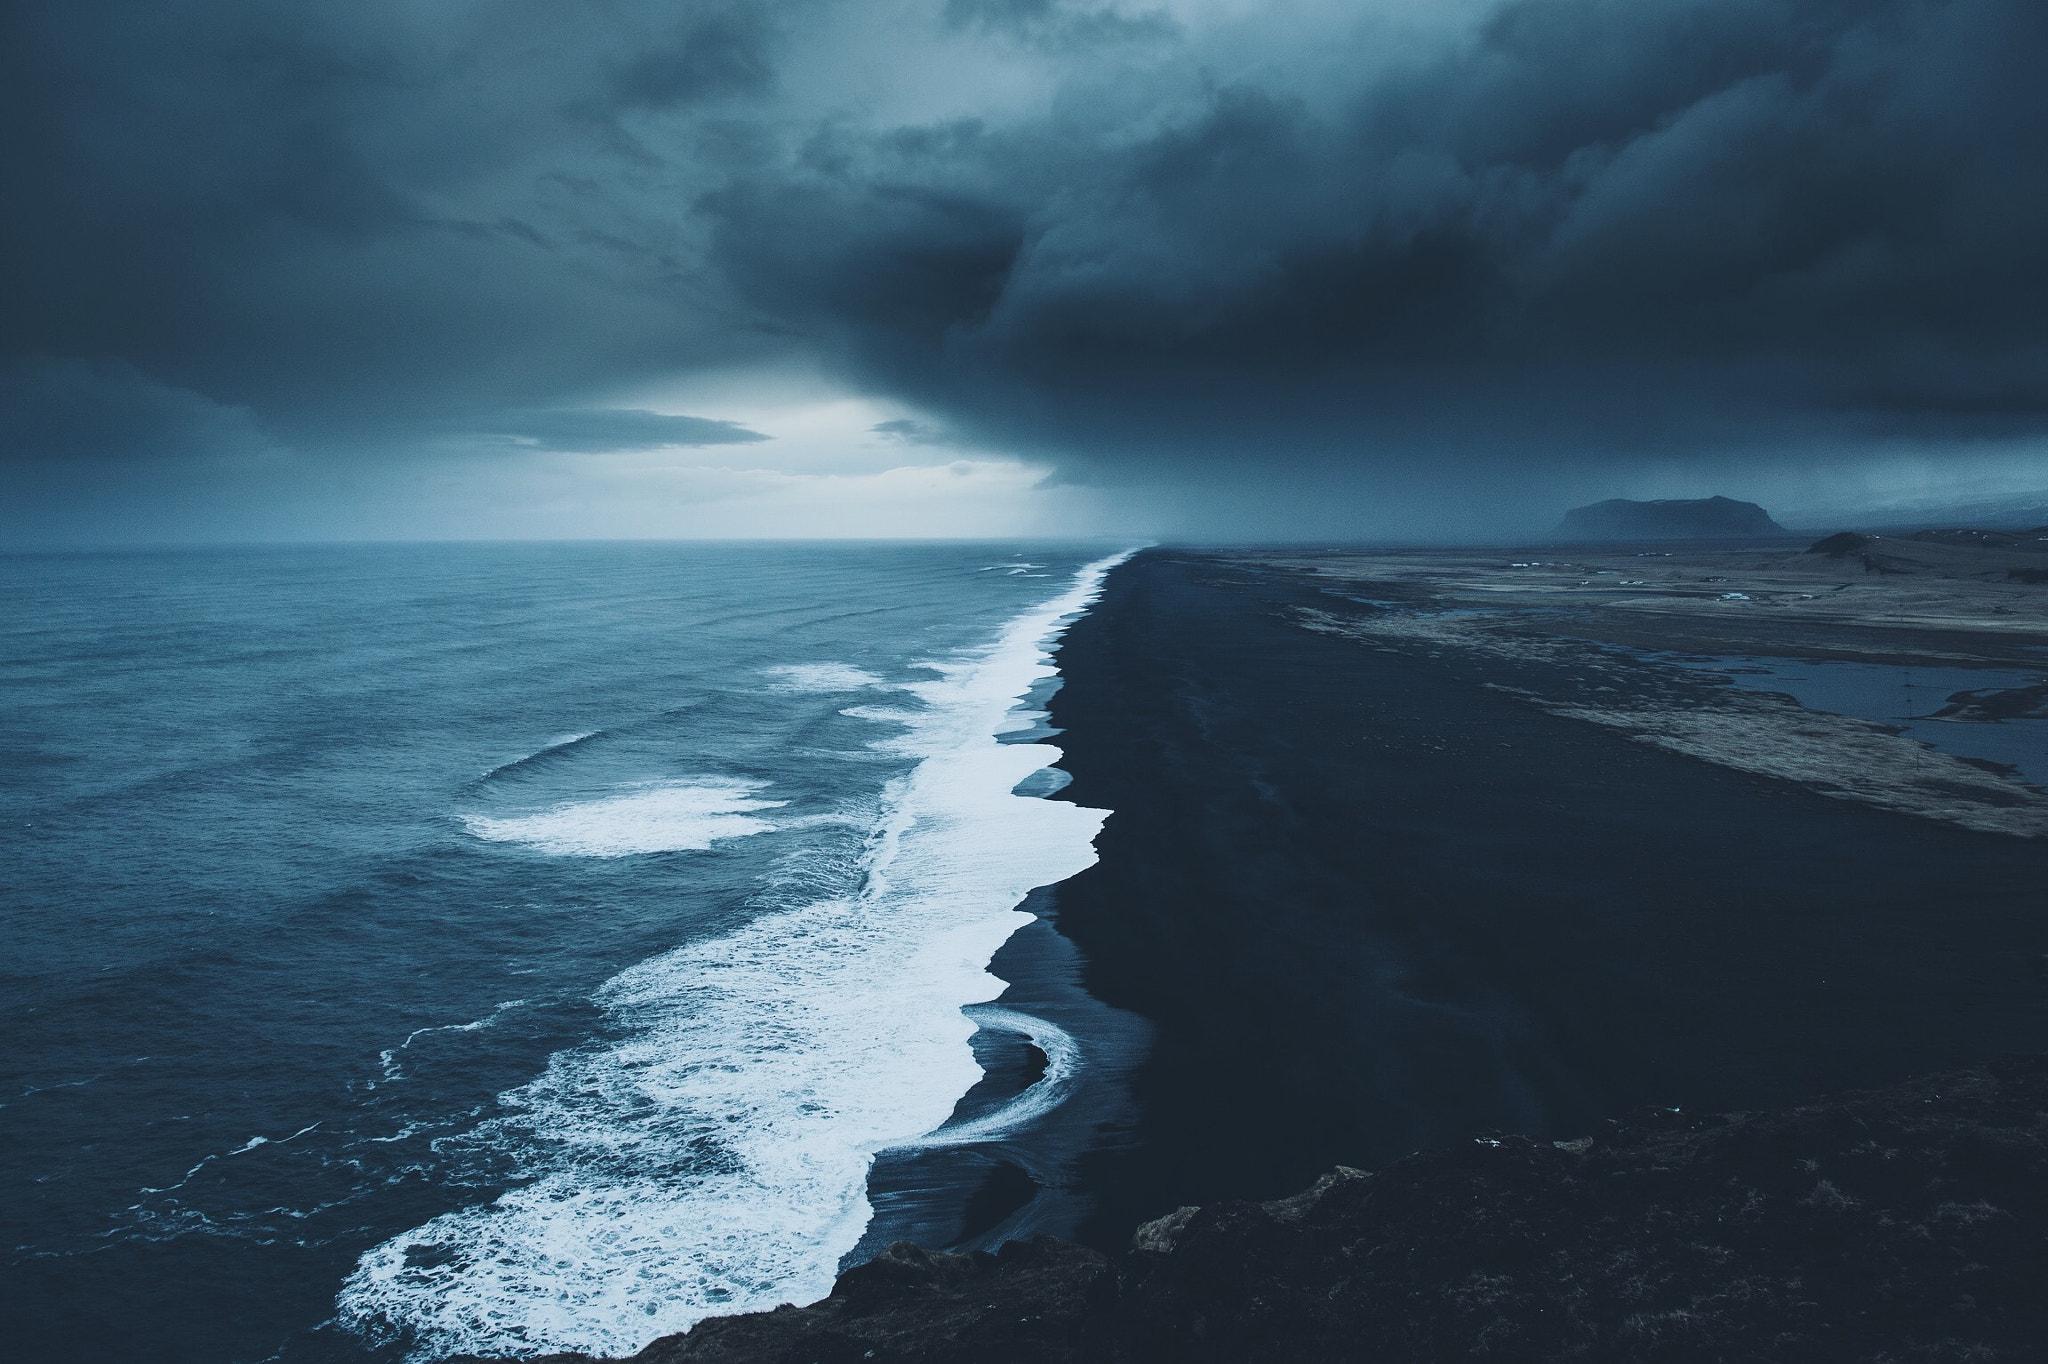 General 2048x1364 landscape Daniel Casson coast shore storm Iceland blue gray black sand overcast sea waves horizon